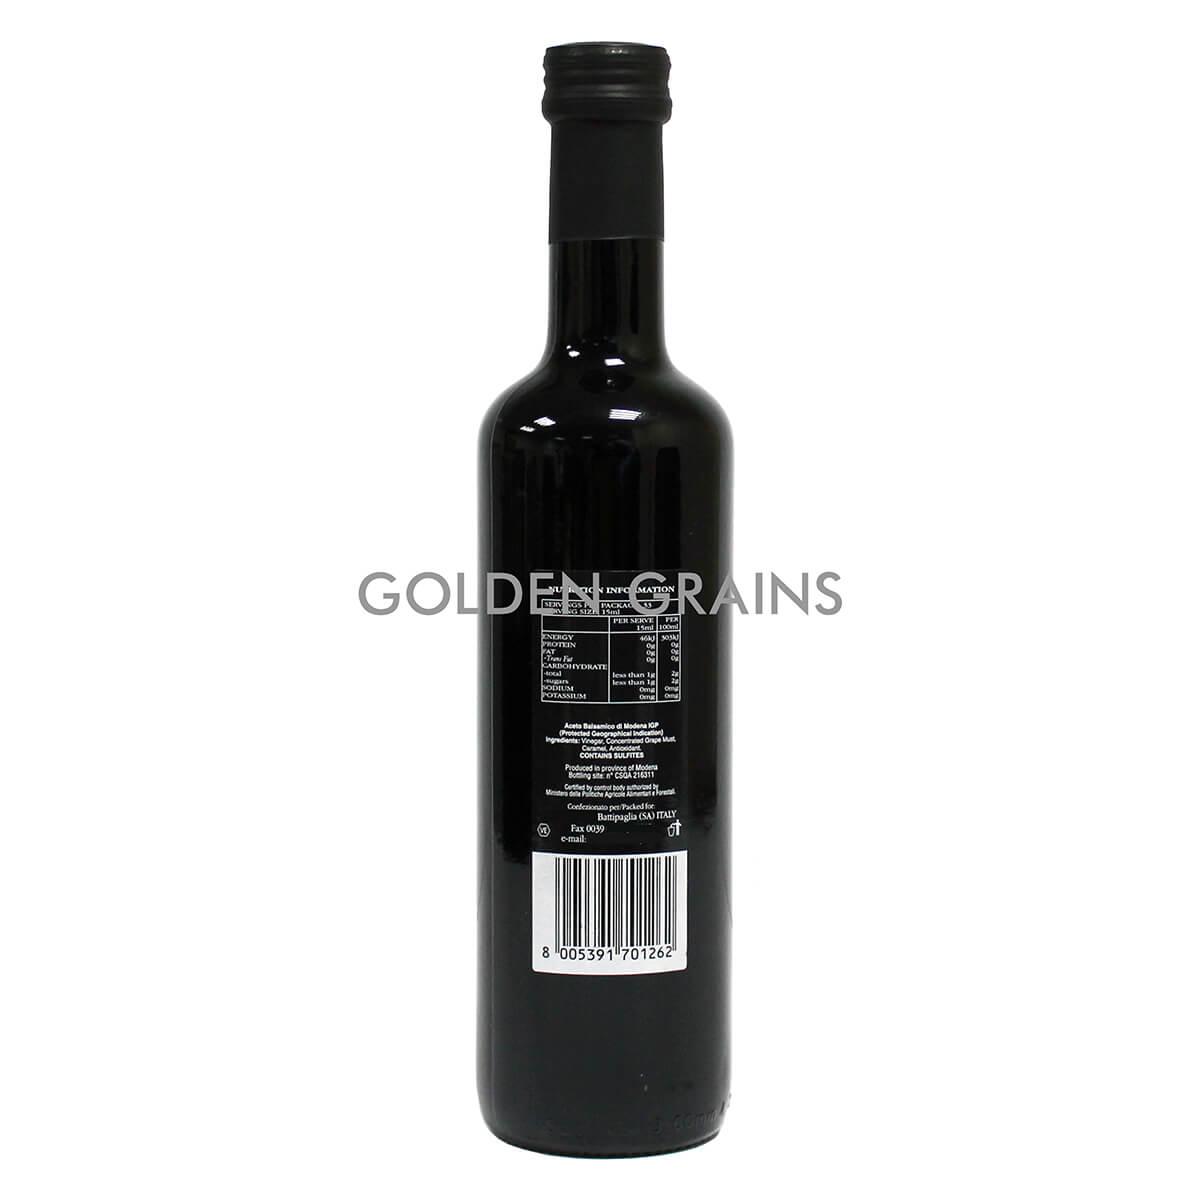 Golden Grains Campagna - Balsamic Vinegar - 500G - Italy - Back.jpg